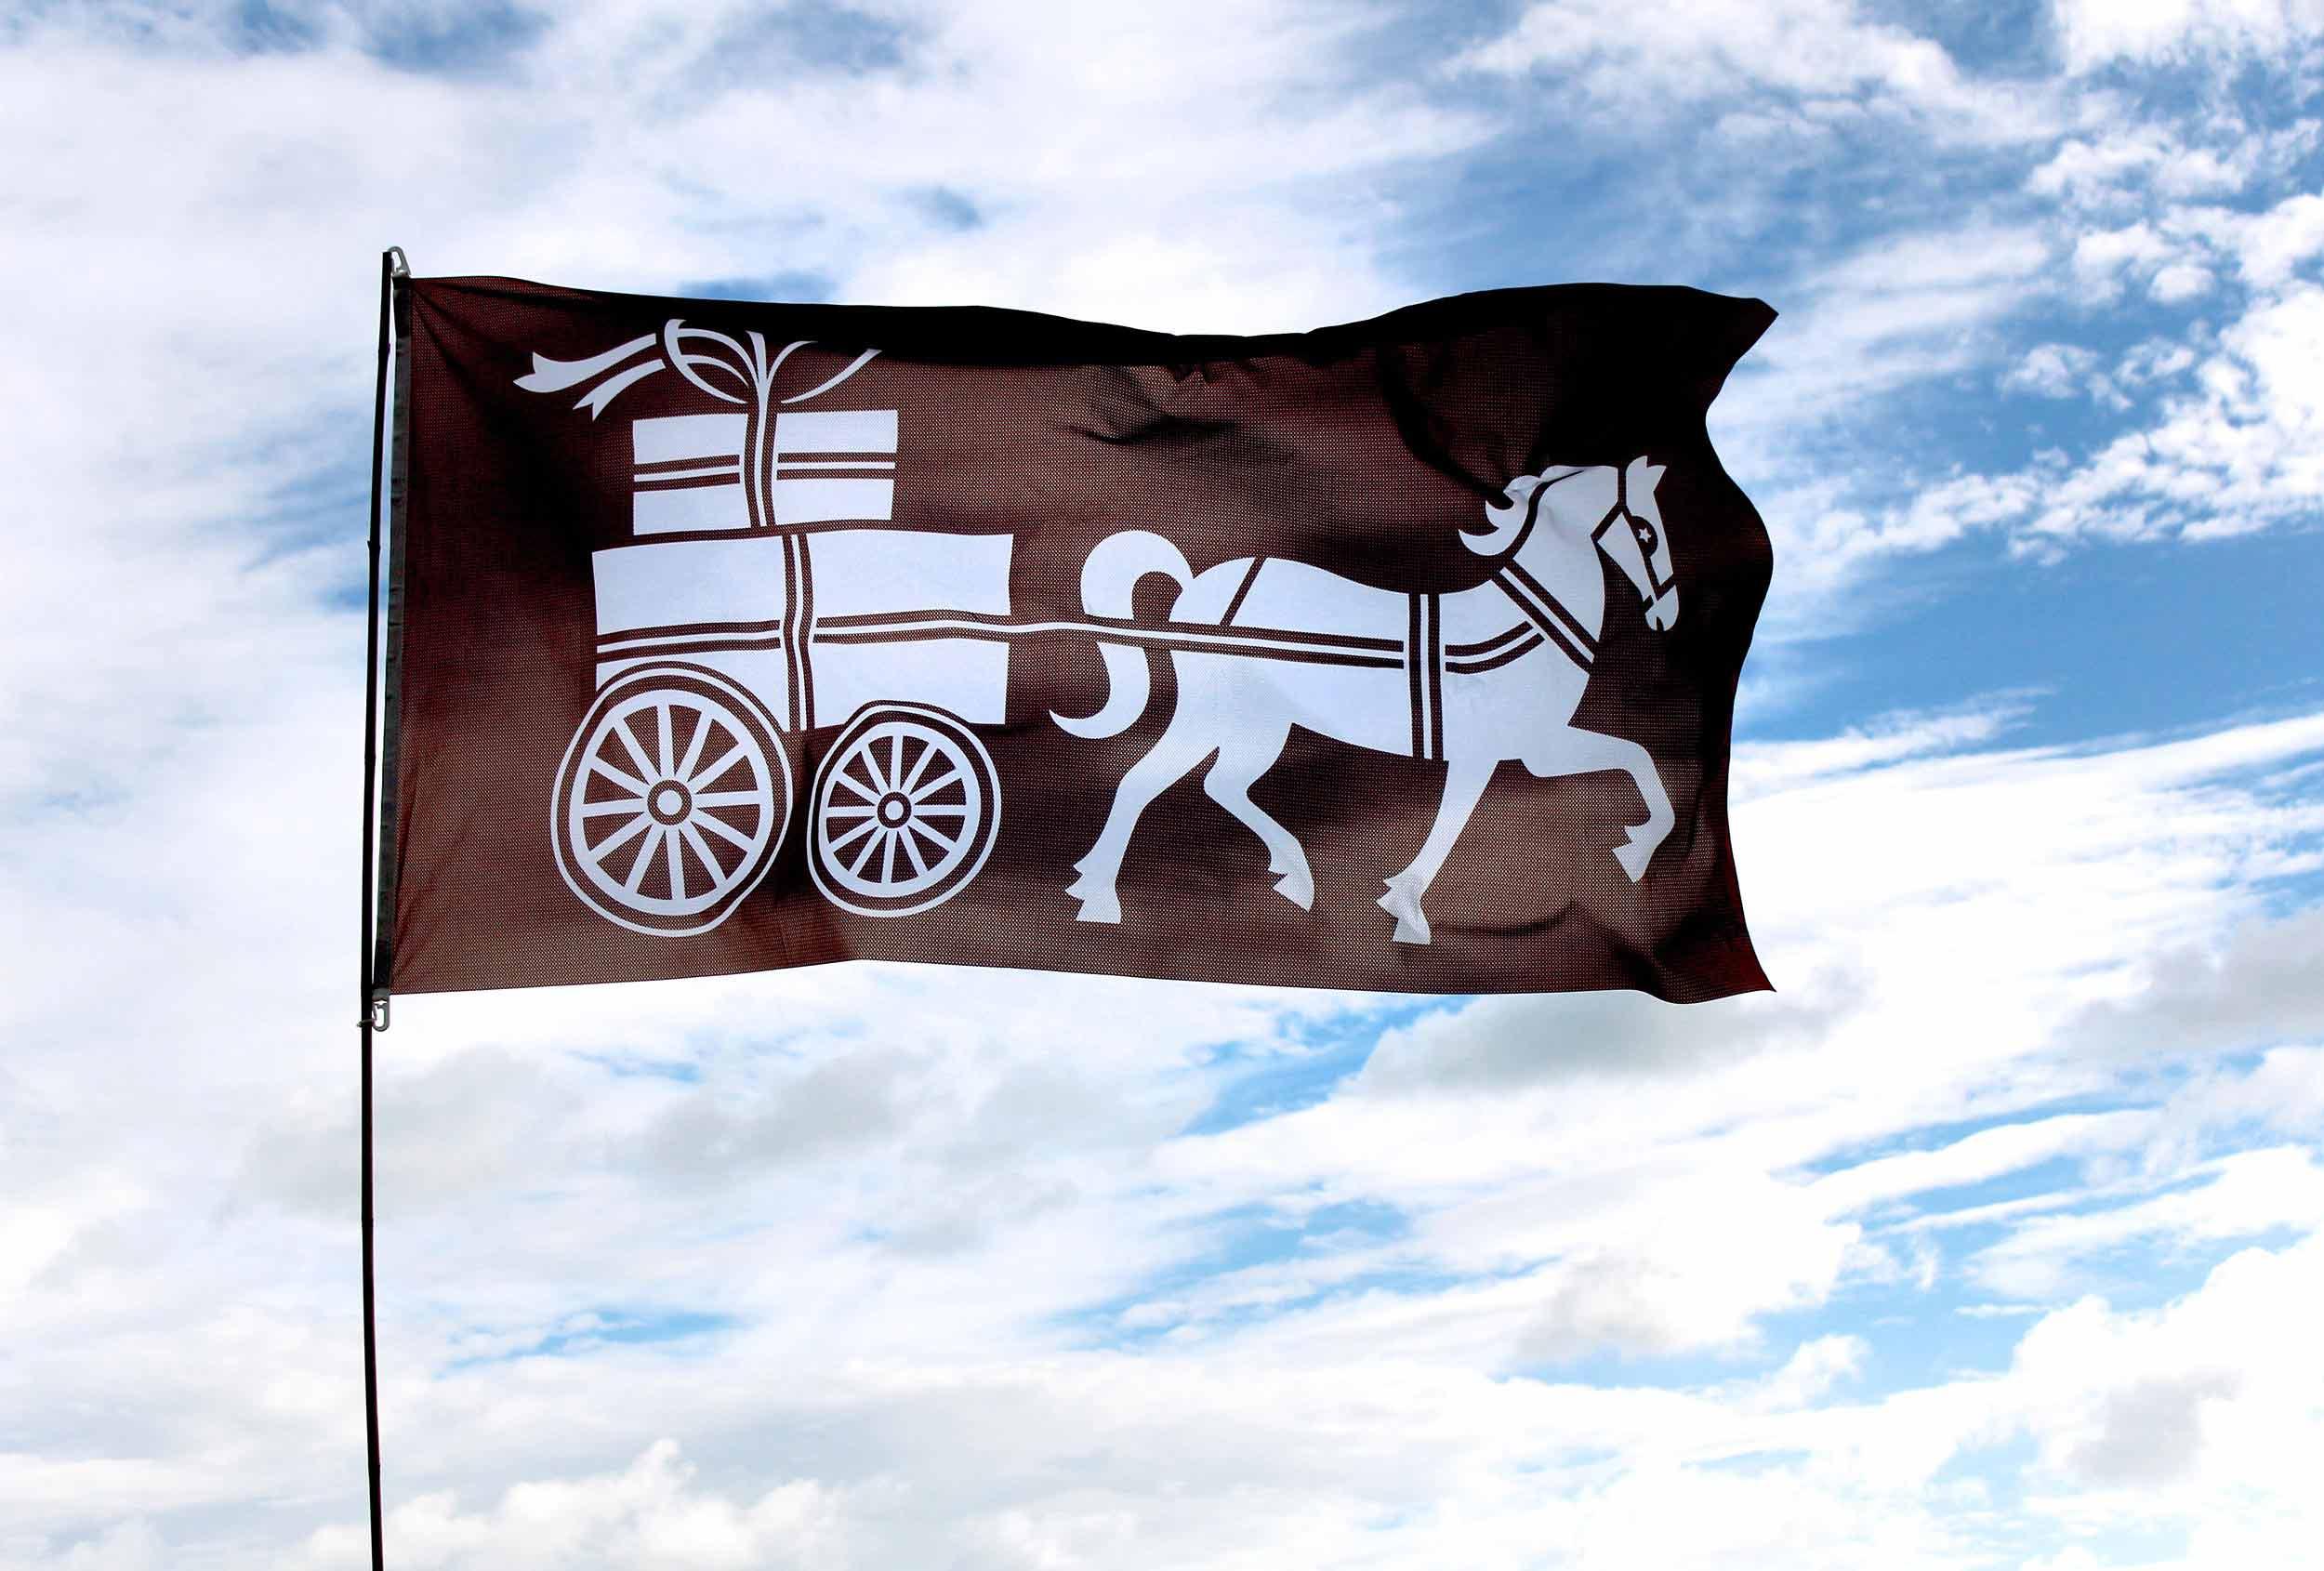 Flying the flag for Caragh Chocolates. Branding design by Distil Studio.